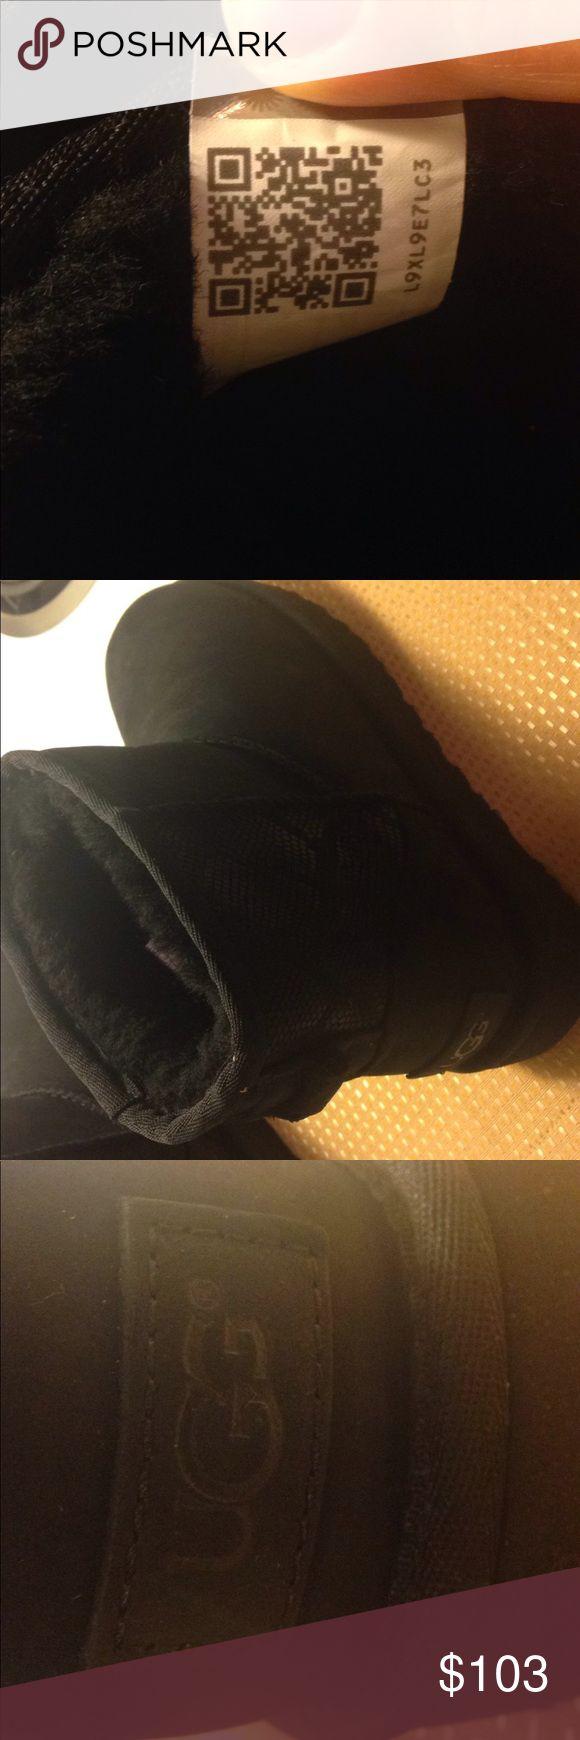 Brand new mini II nubuck UGG boots Authentic UGG mini boot with snake skin panel on back. Brand new, beautiful! Super cute! UGG Shoes Winter & Rain Boots